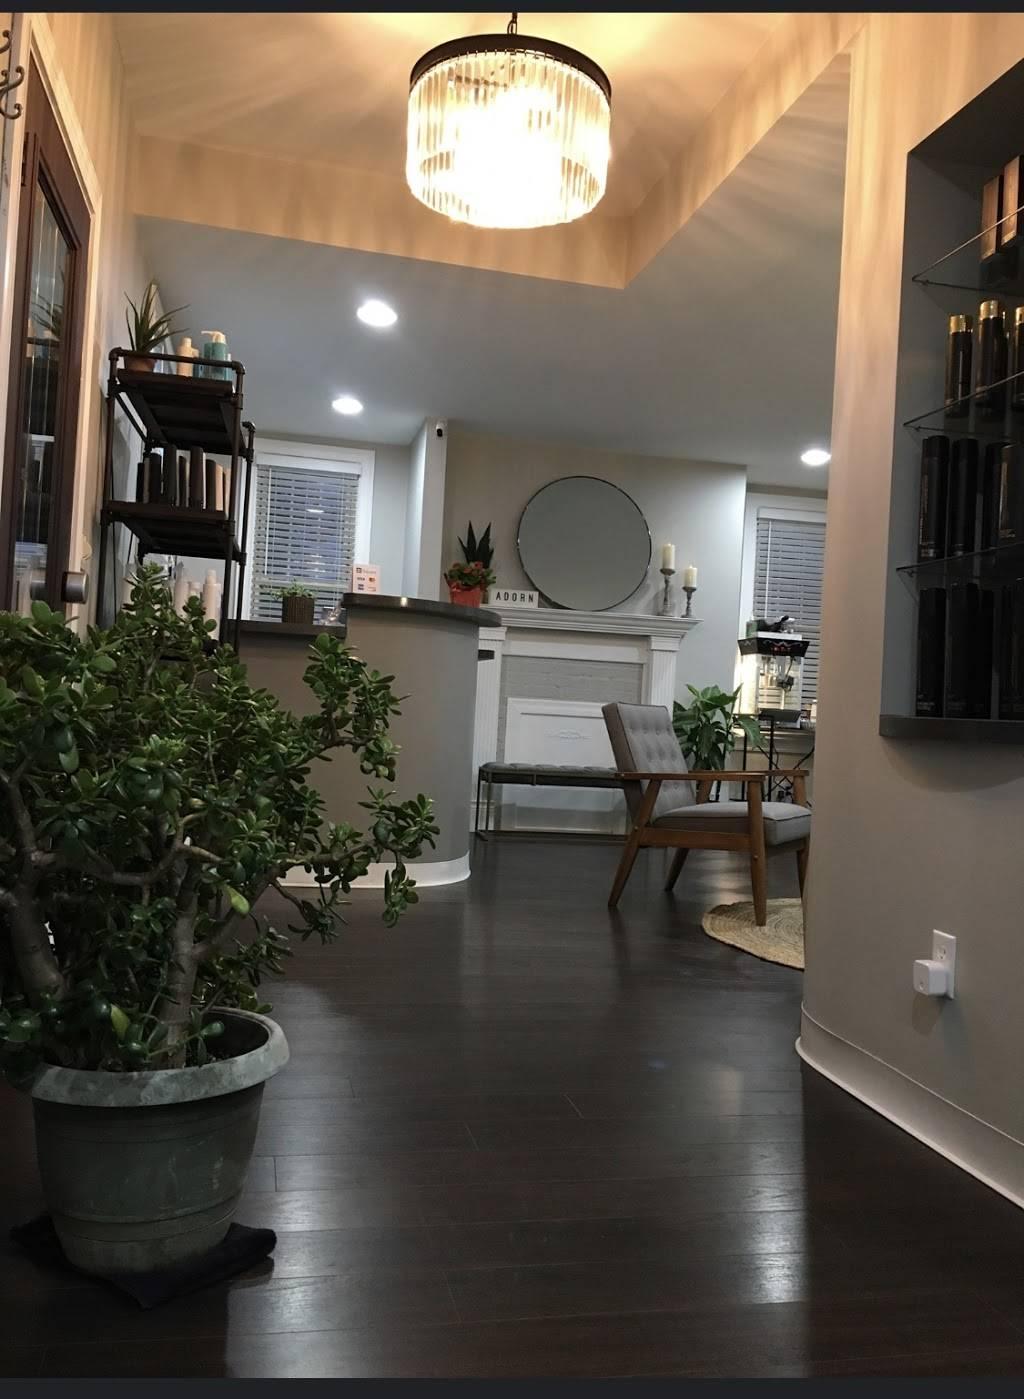 Adorn Salon - hair care  | Photo 7 of 9 | Address: 2893 Washington St, Burlington, KY 41005, USA | Phone: (859) 586-2600